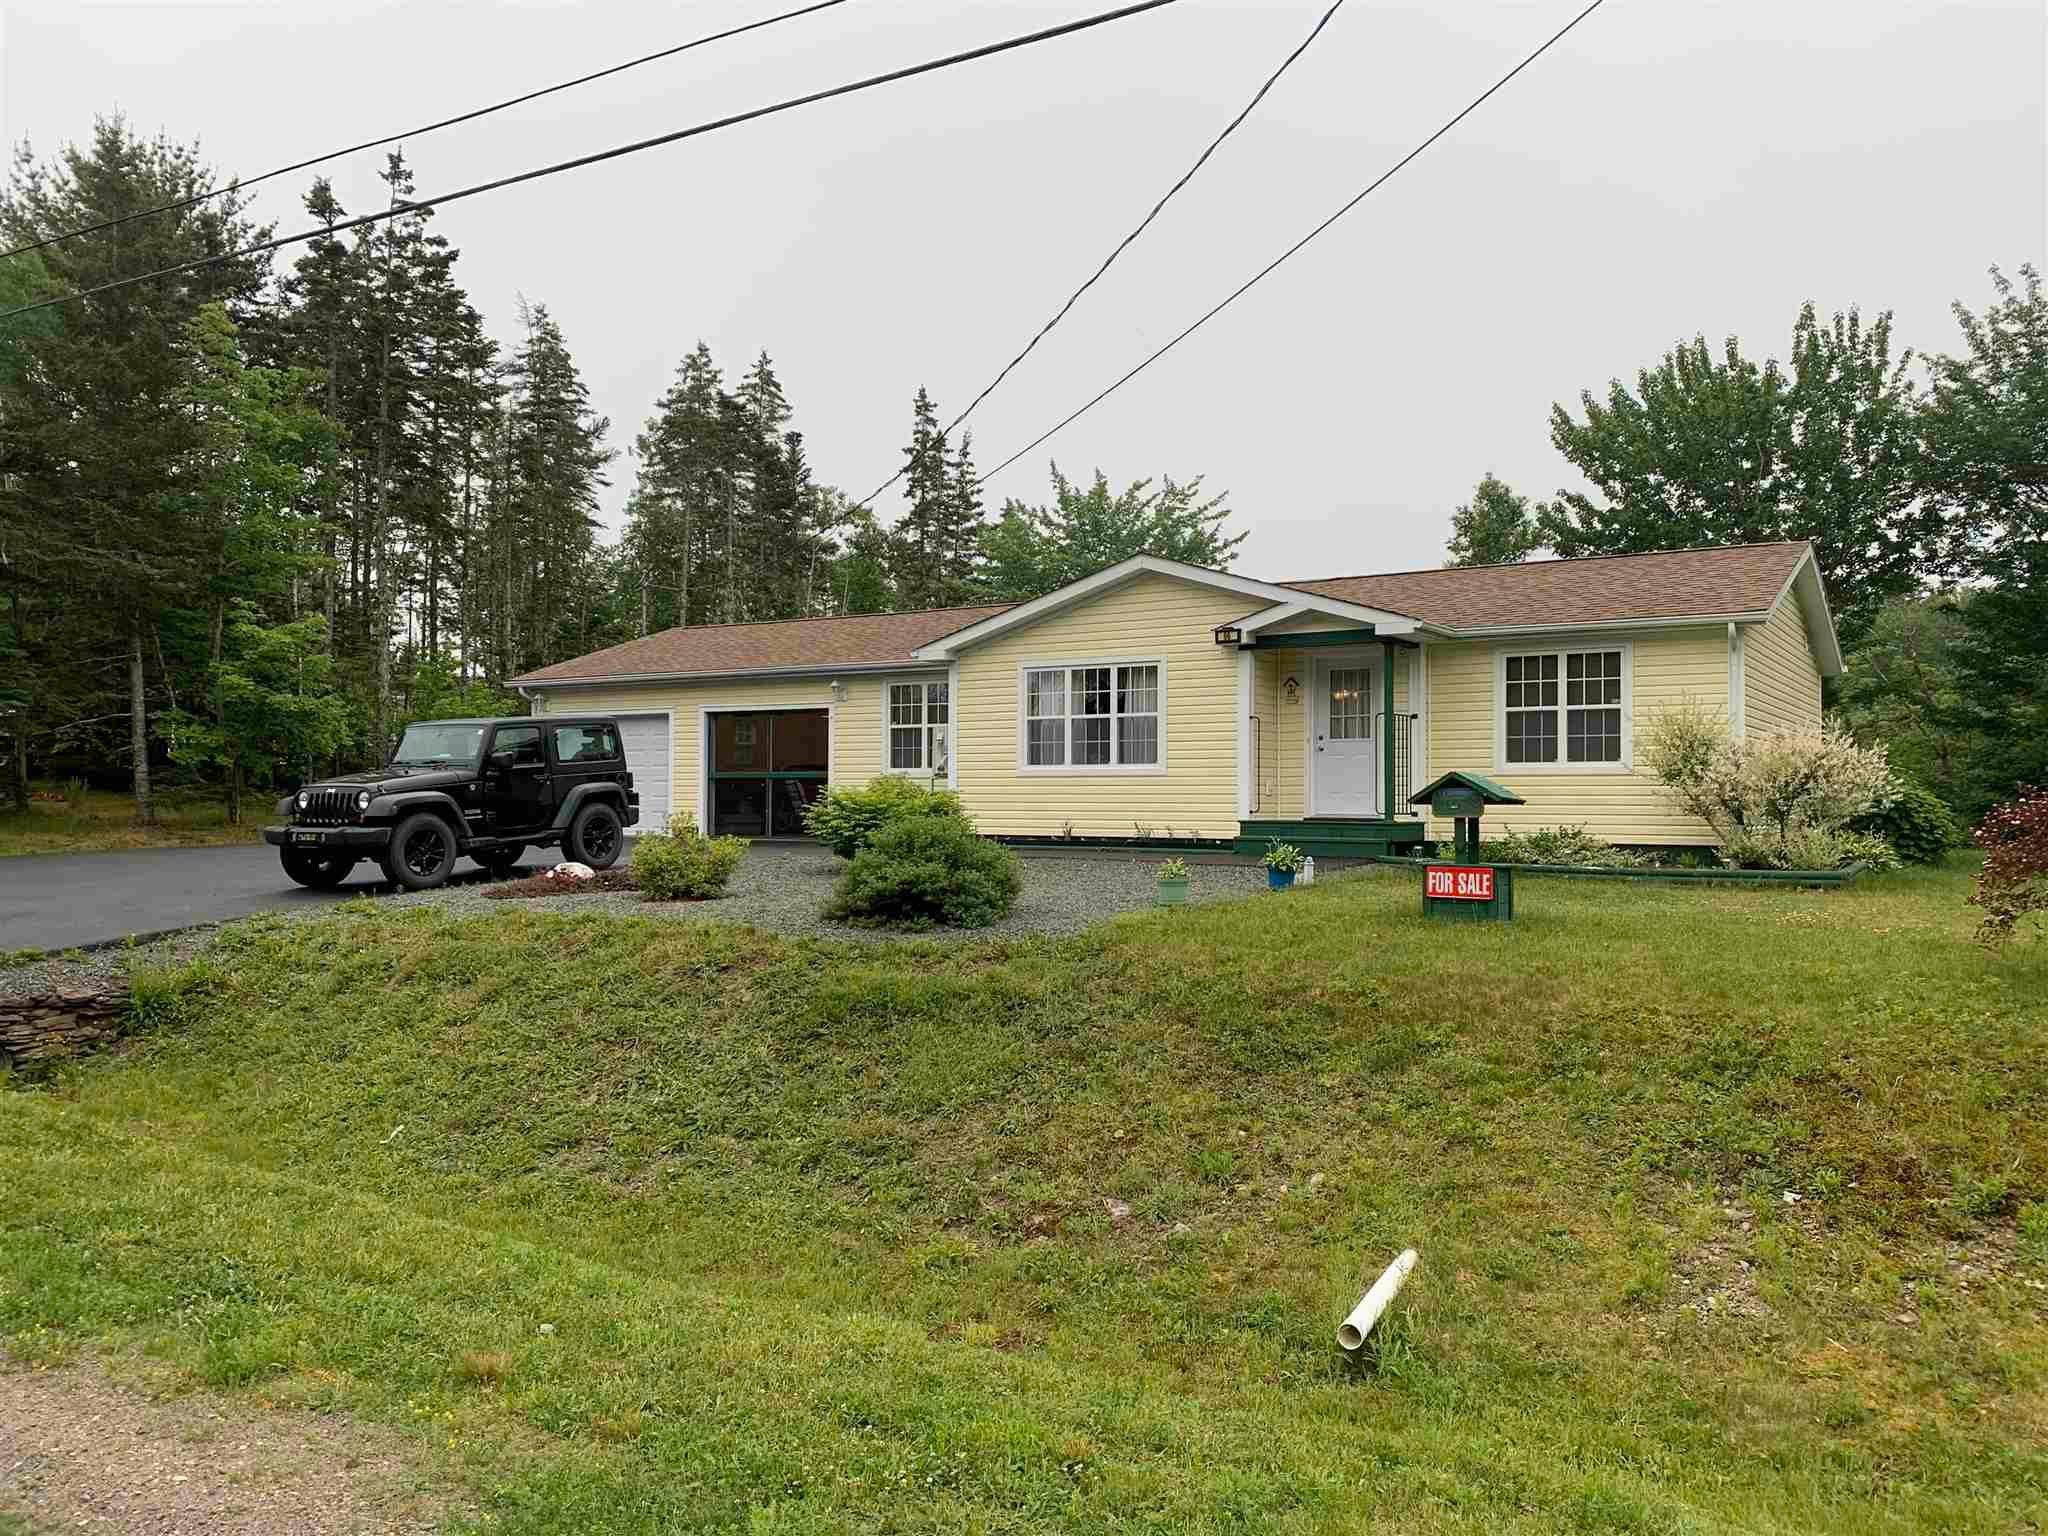 Main Photo: 66 Schaller Drive in Sydney Forks: 201-Sydney Residential for sale (Cape Breton)  : MLS®# 202116799